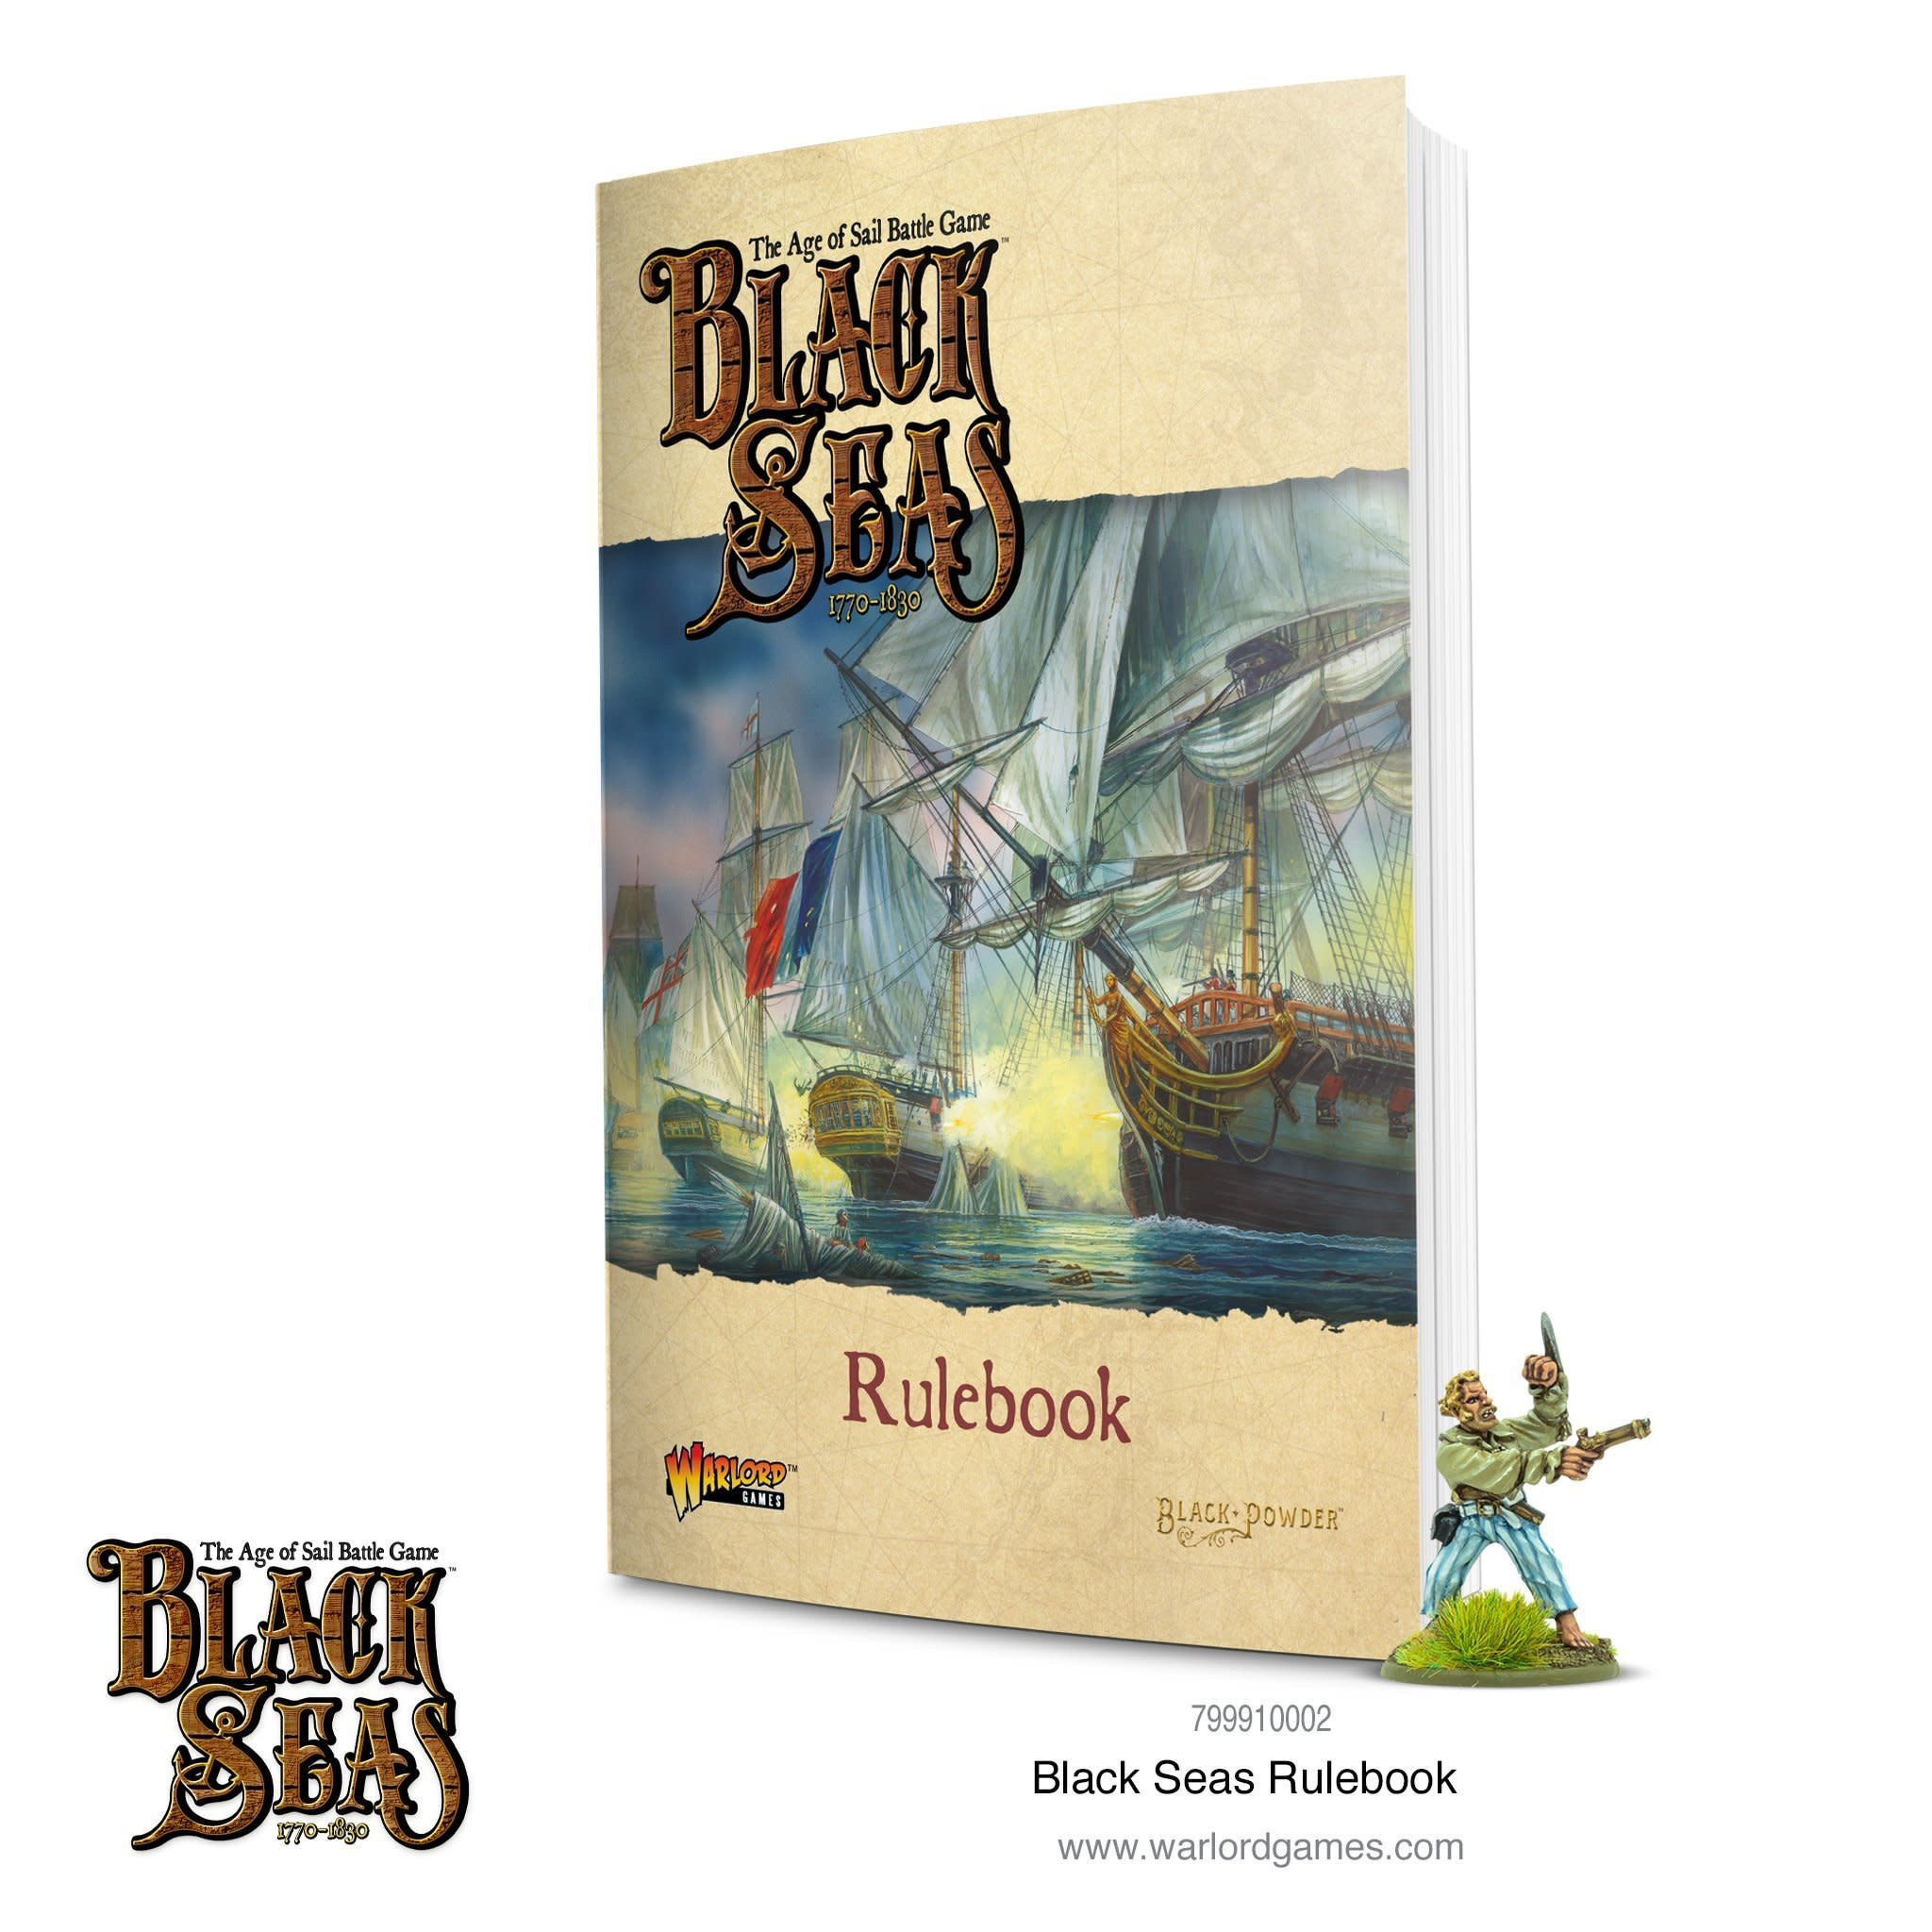 Warlord games Black Seas: Core Rulebook